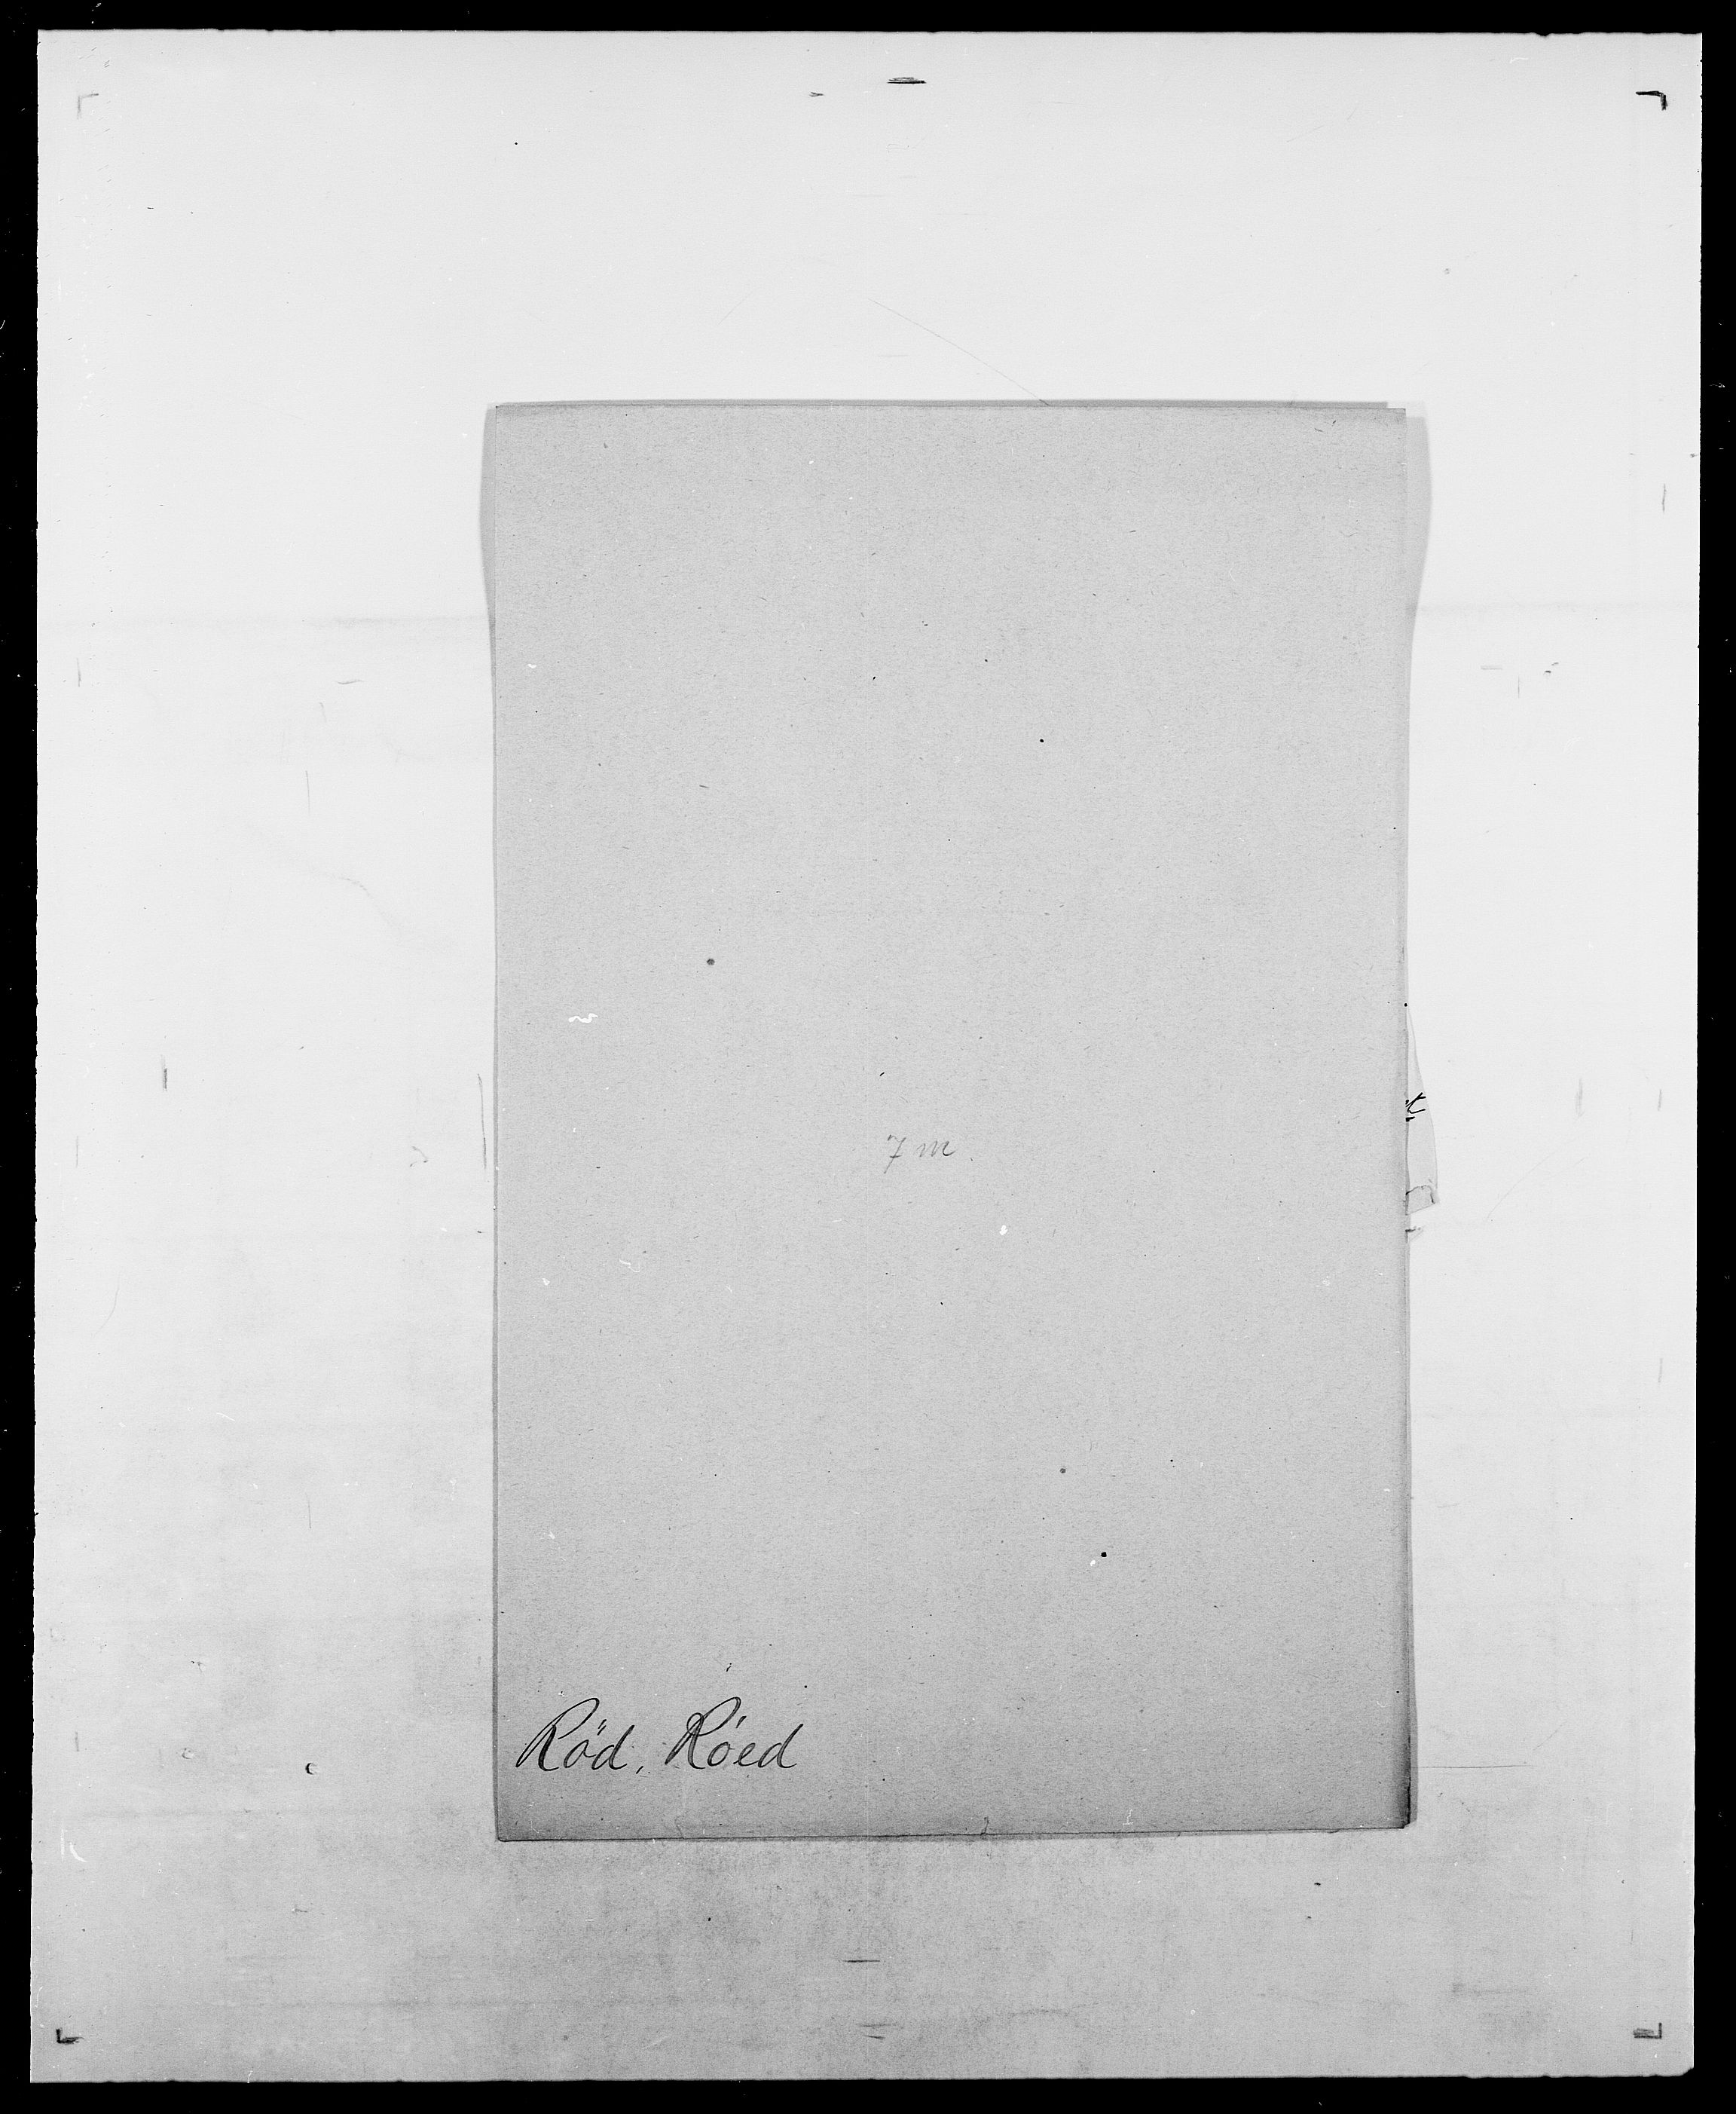 SAO, Delgobe, Charles Antoine - samling, D/Da/L0033: Roald - Røyem, s. 644